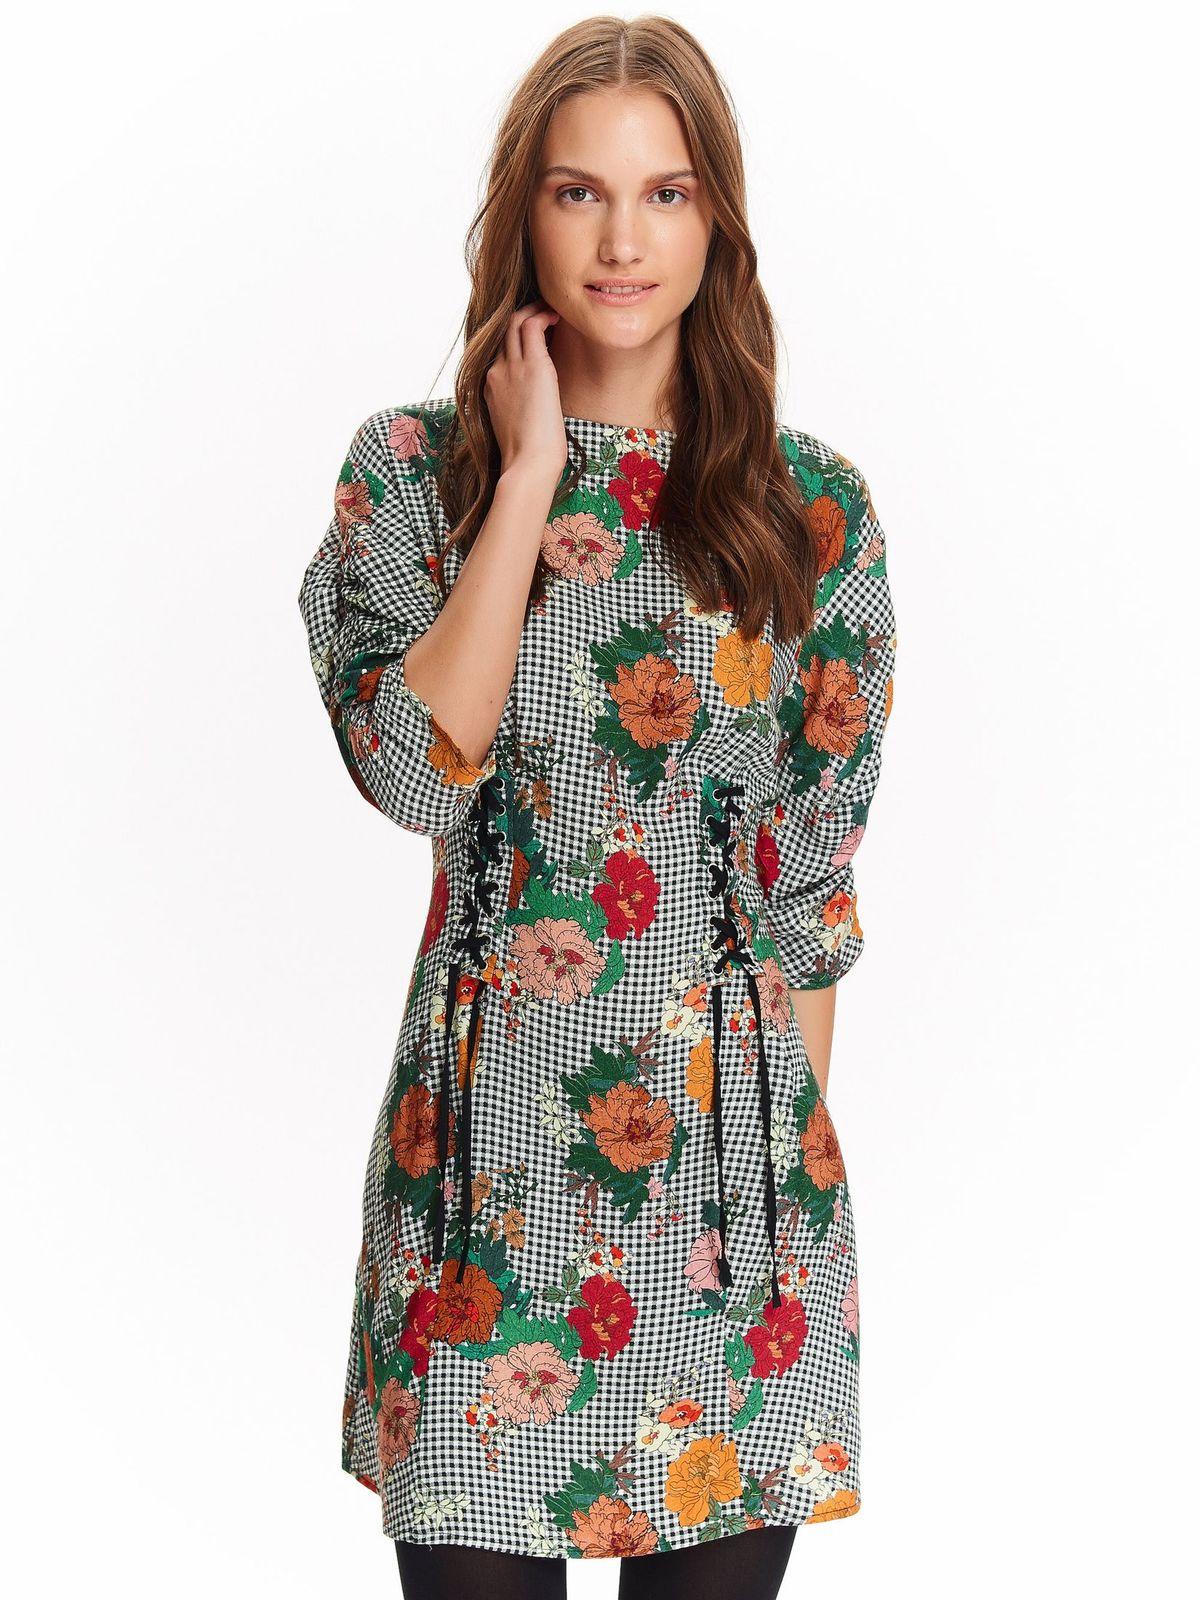 TOP SECRET φορεμα με φλοραλ print - 165481